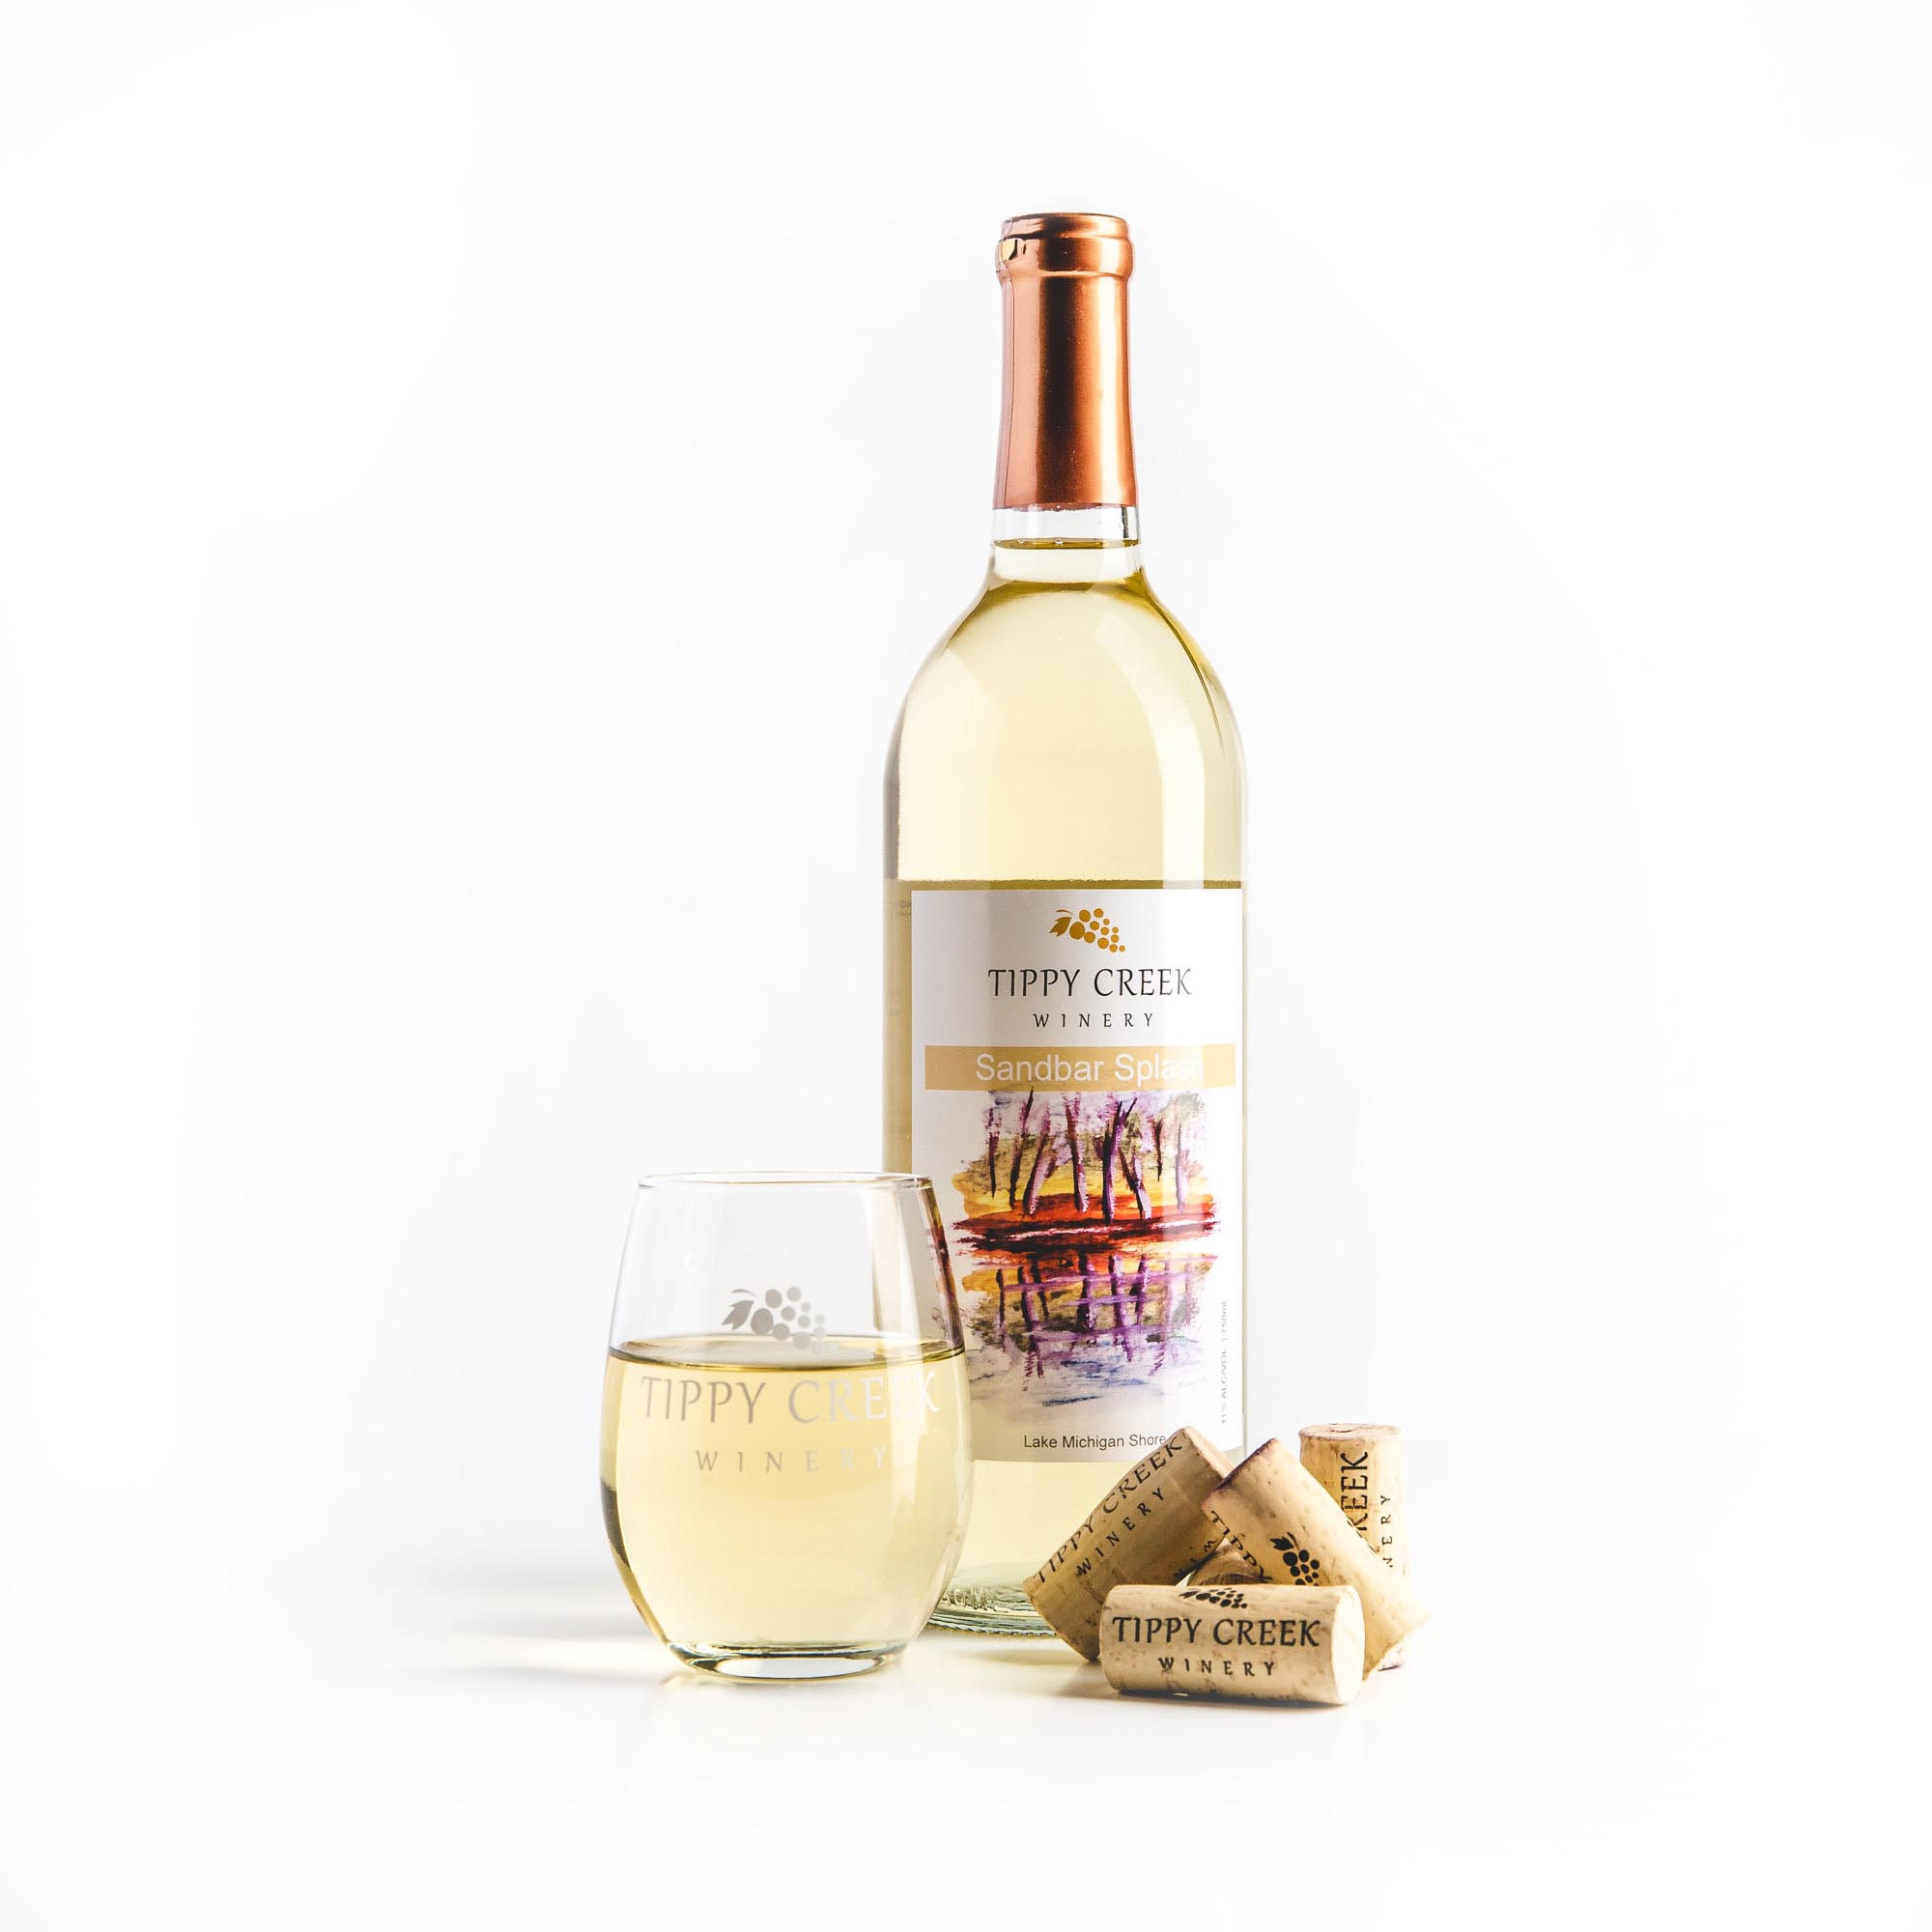 Sandbar Splash White Wine Tippy Creek Winery